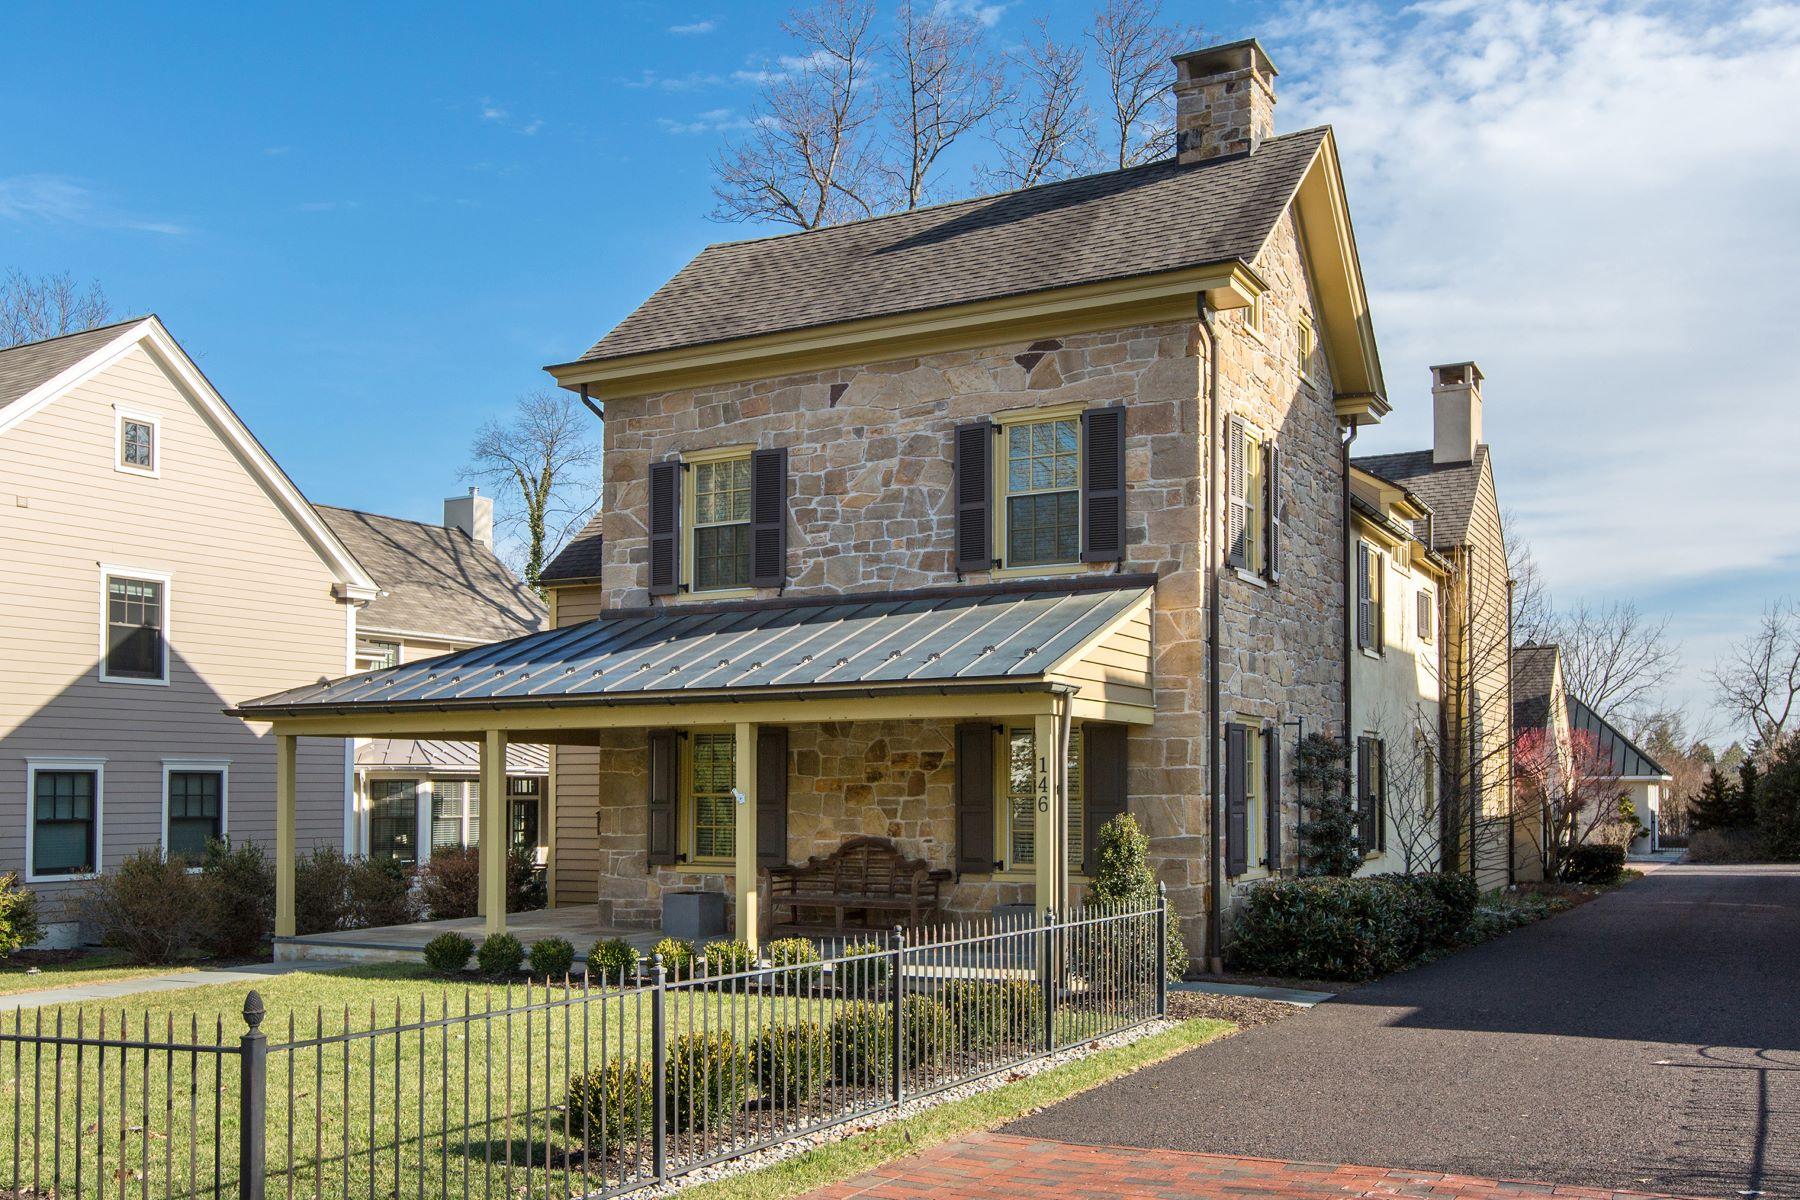 Single Family Home for Sale at 146 E Ashland St Doylestown, Pennsylvania, 18901 United States